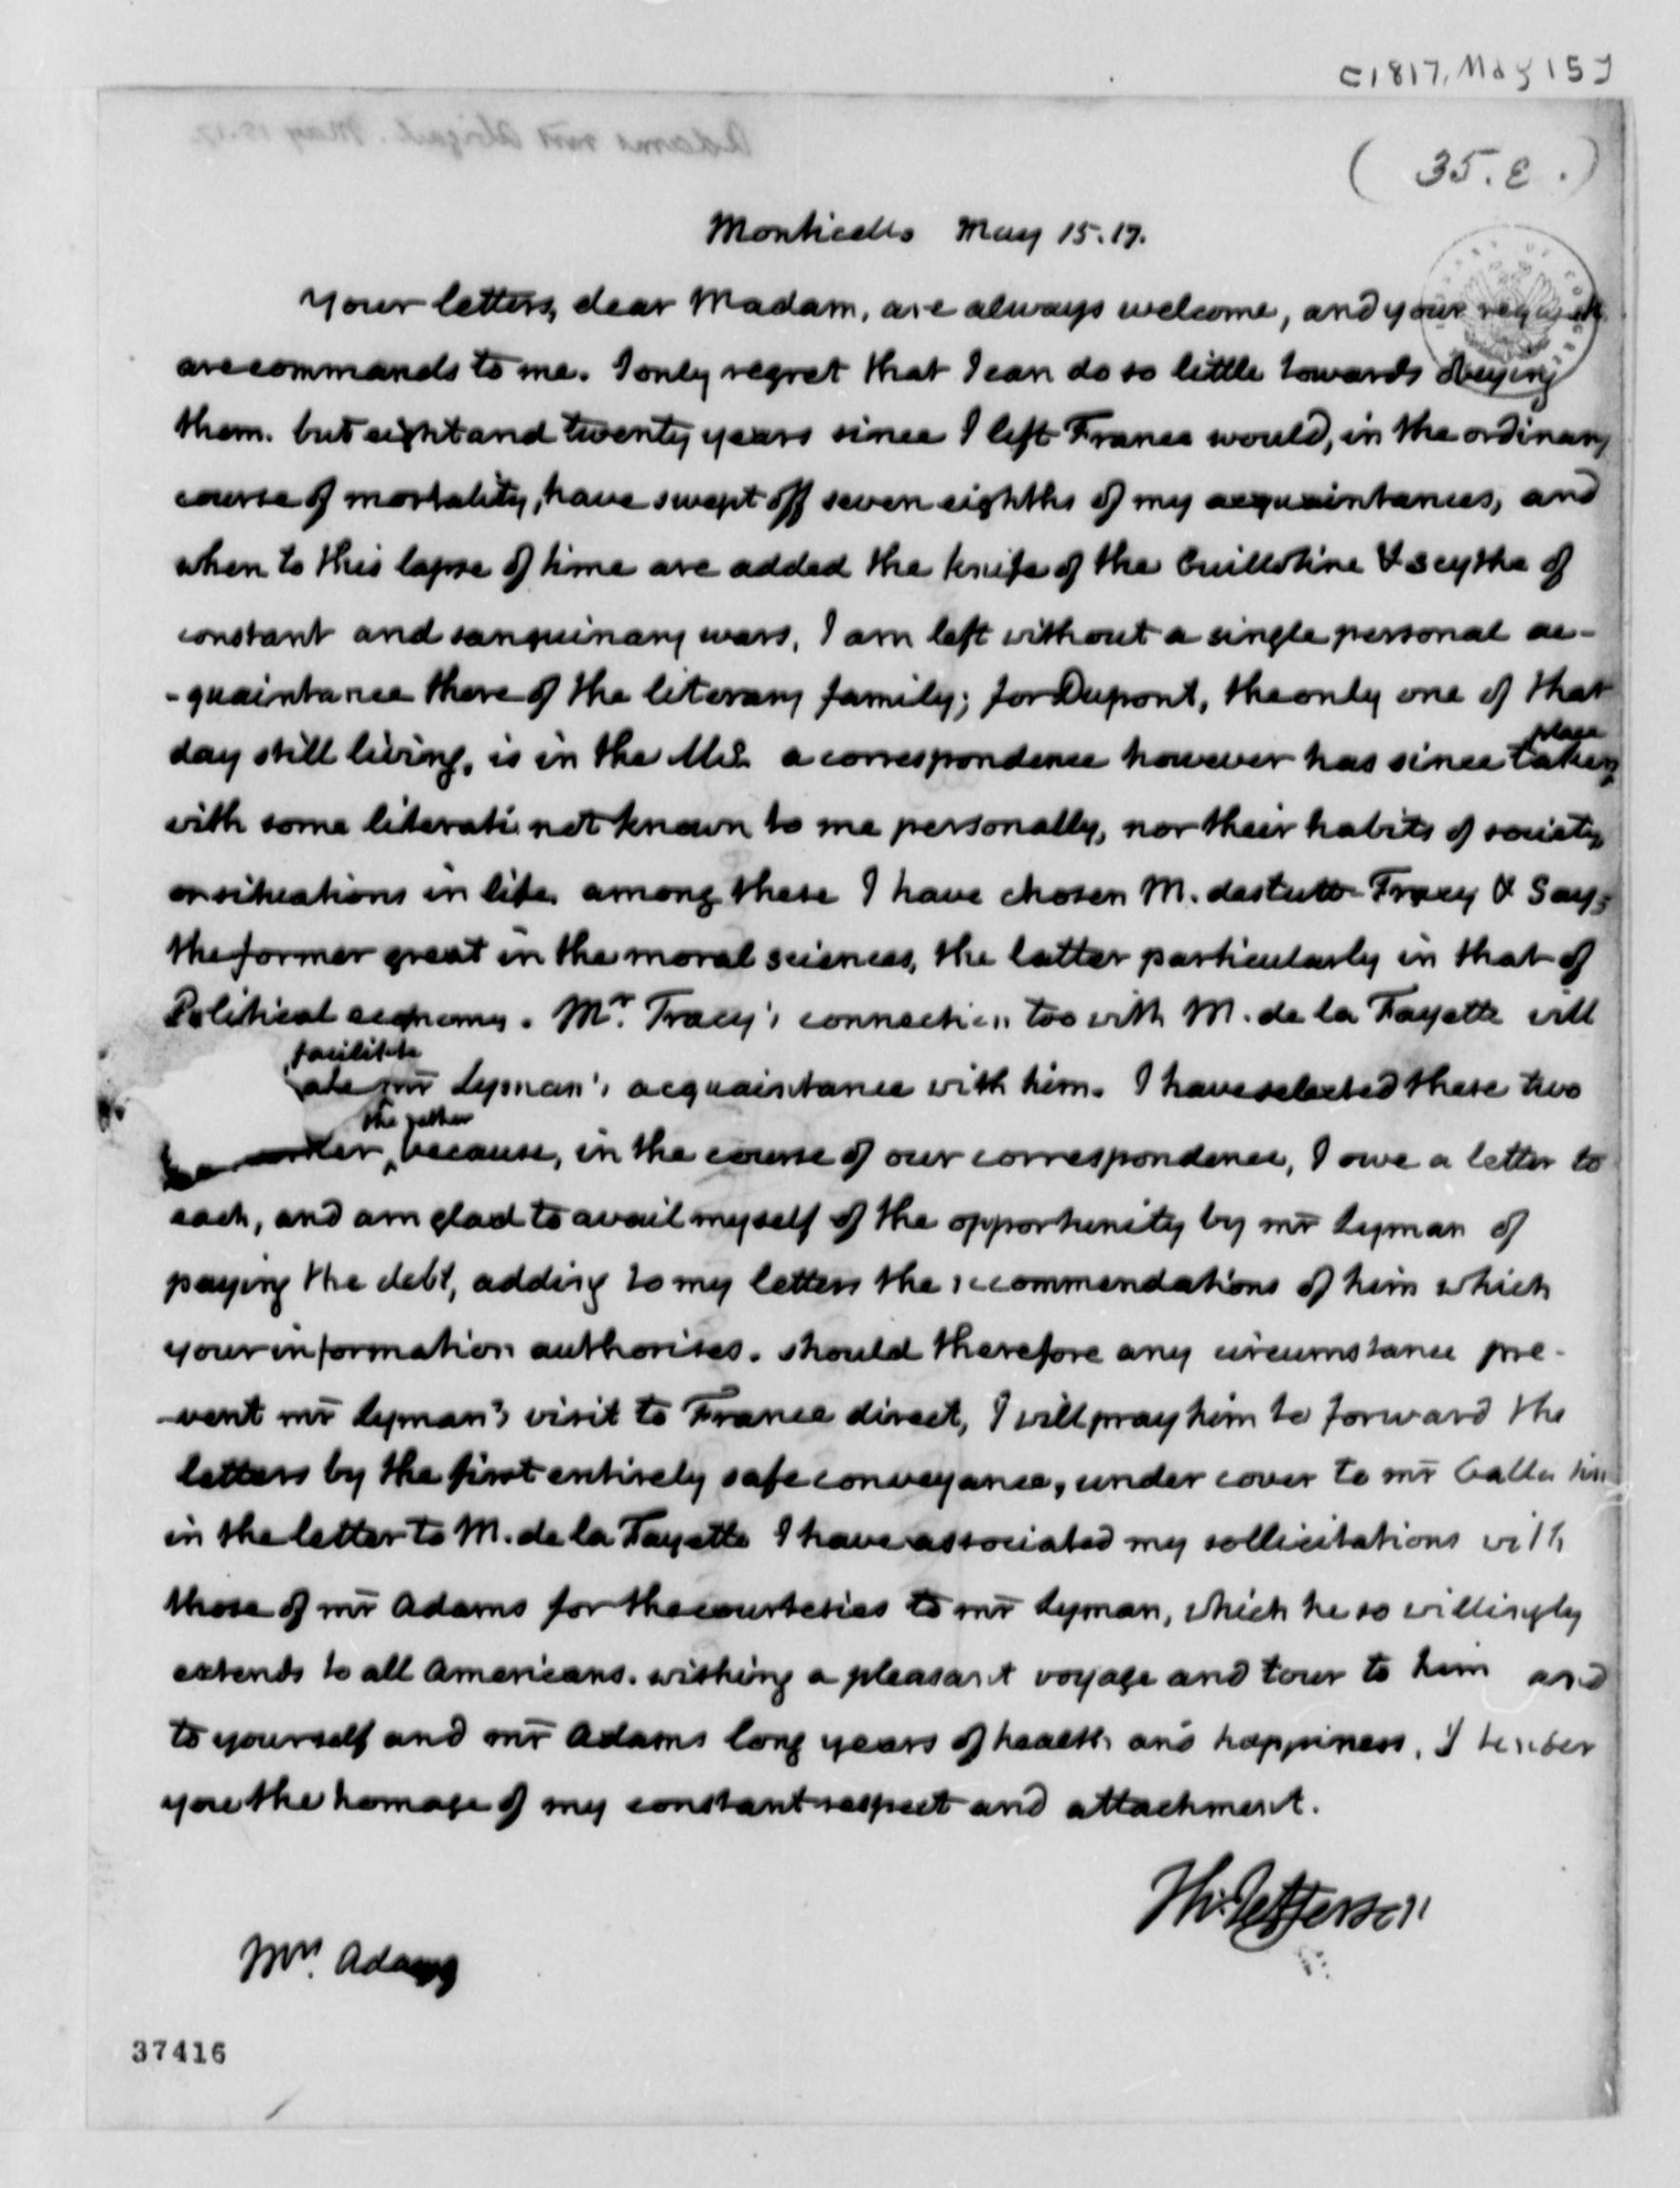 009 Thomas Jefferson Essay Magnificent Questions High School Sample 1920